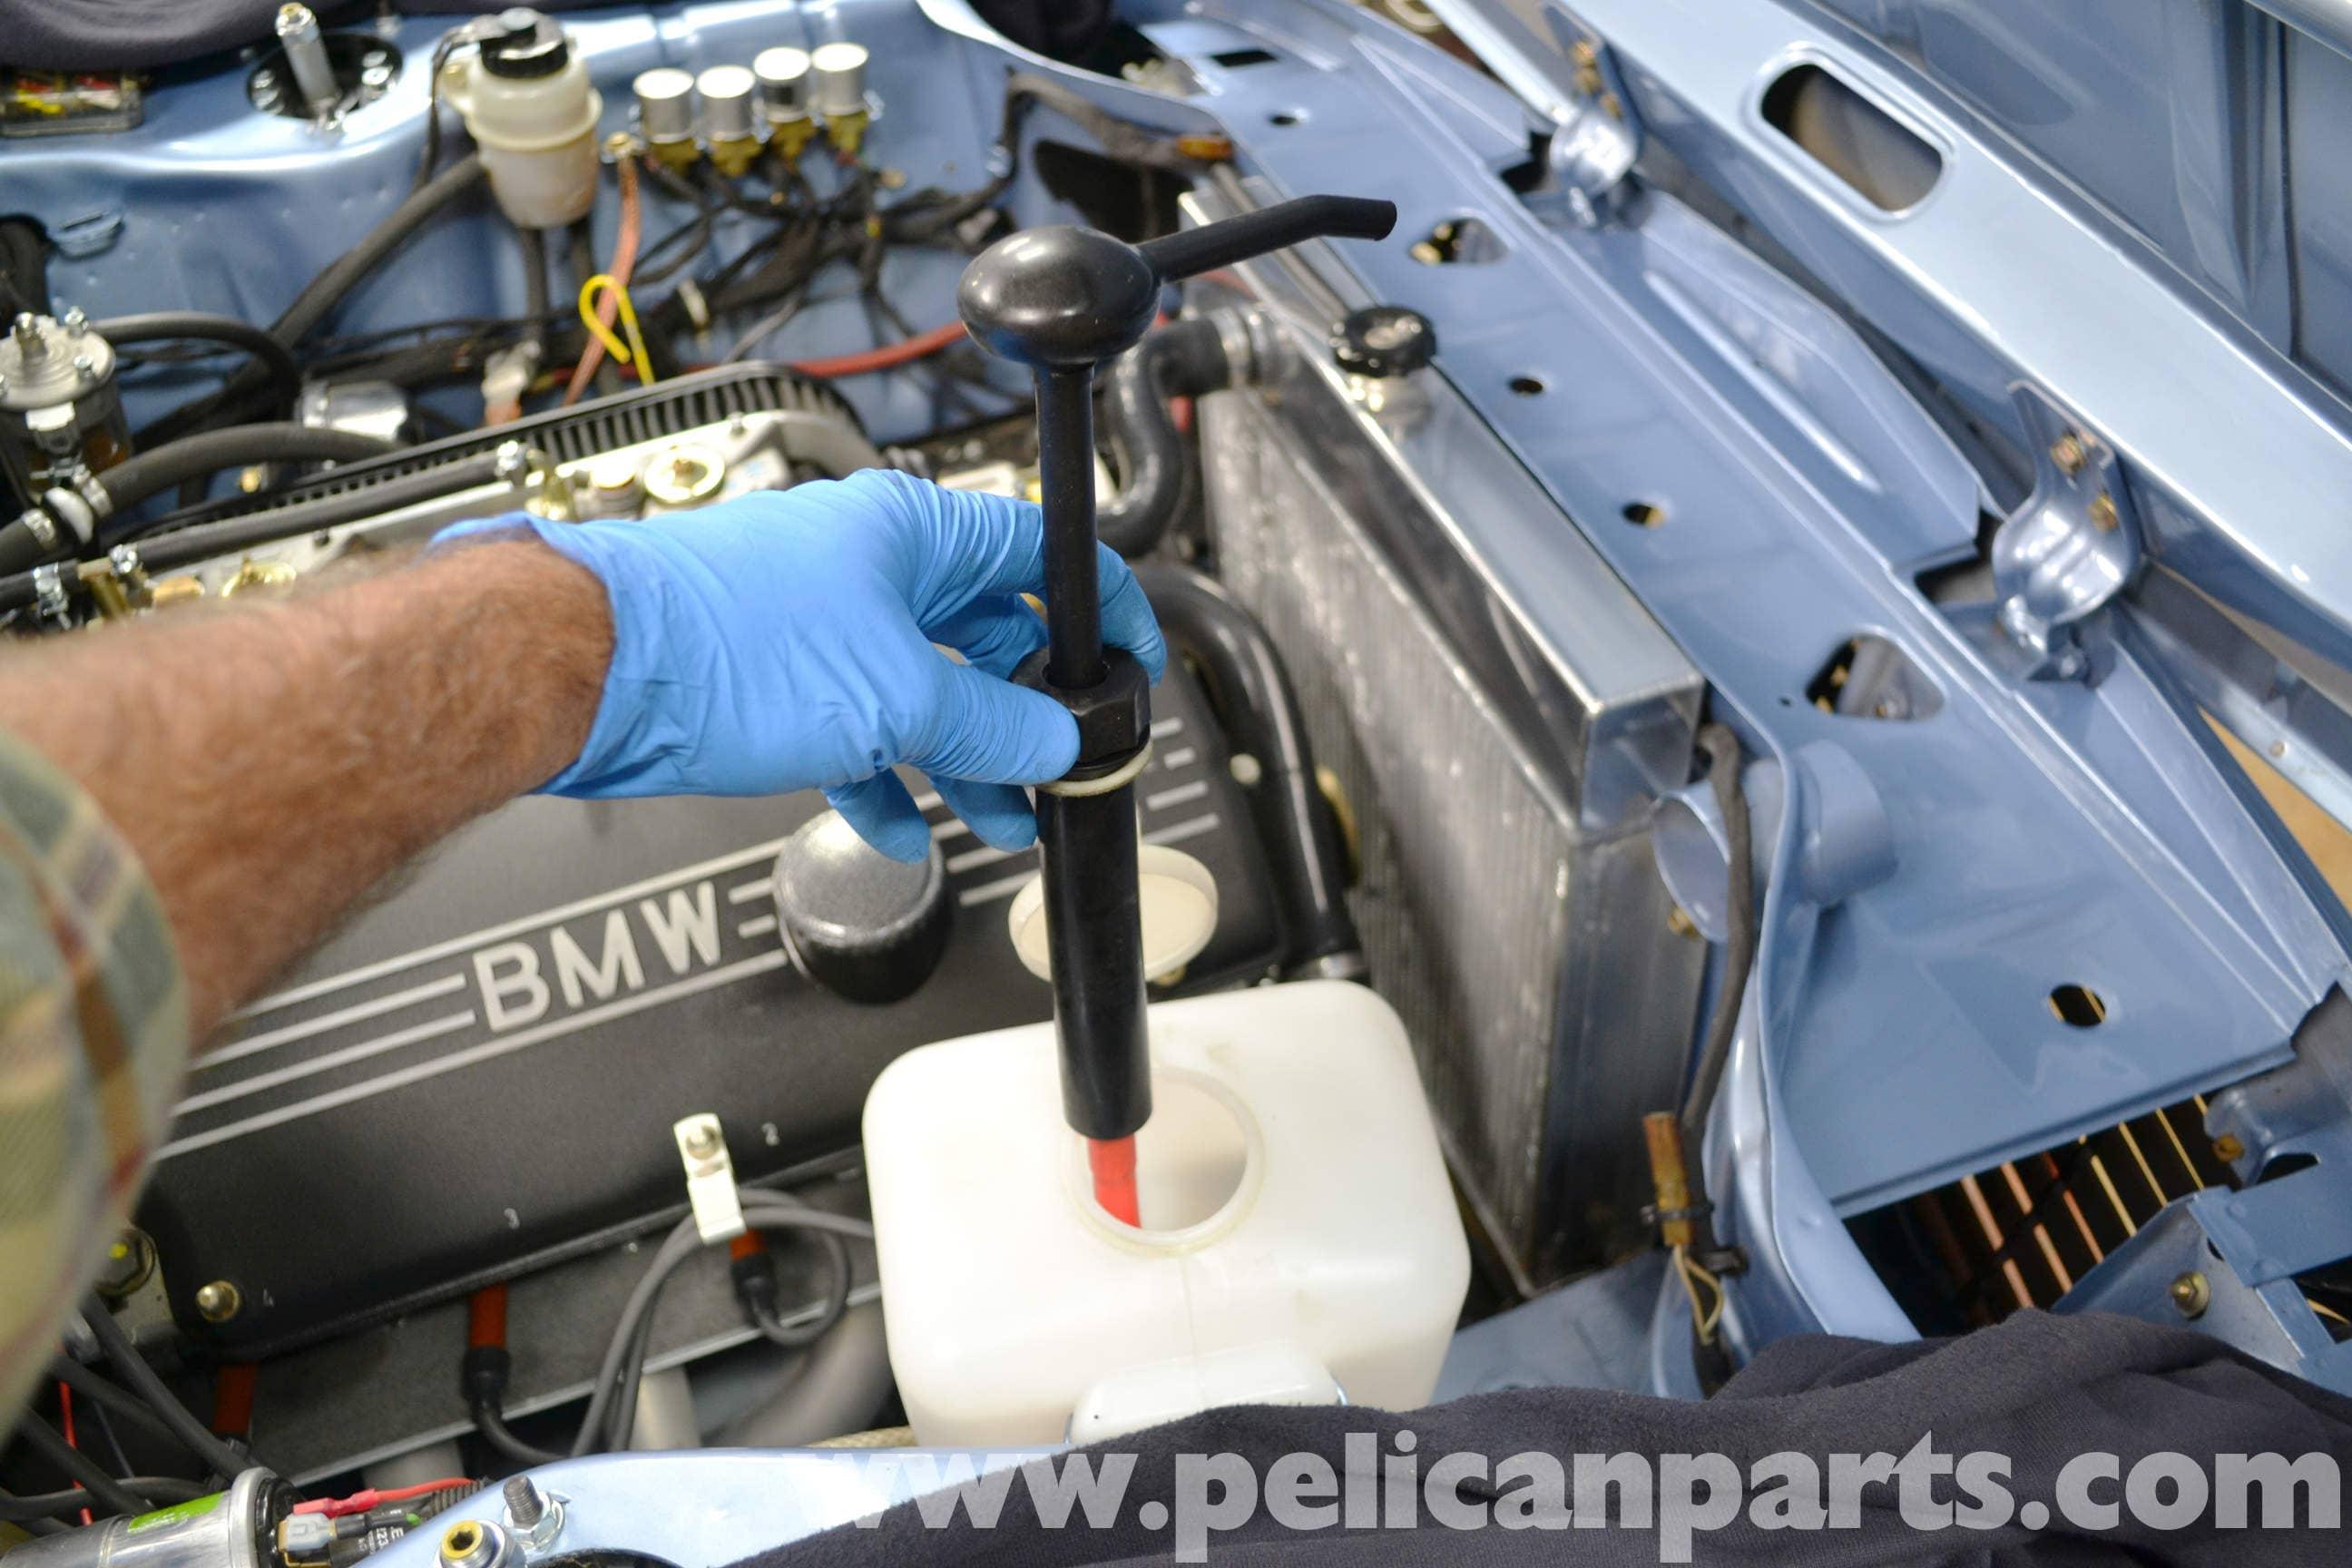 1976 BMW 2002 Parts >> BMW 2002 Windshield Washer Reservoir Replacement (1966 ...